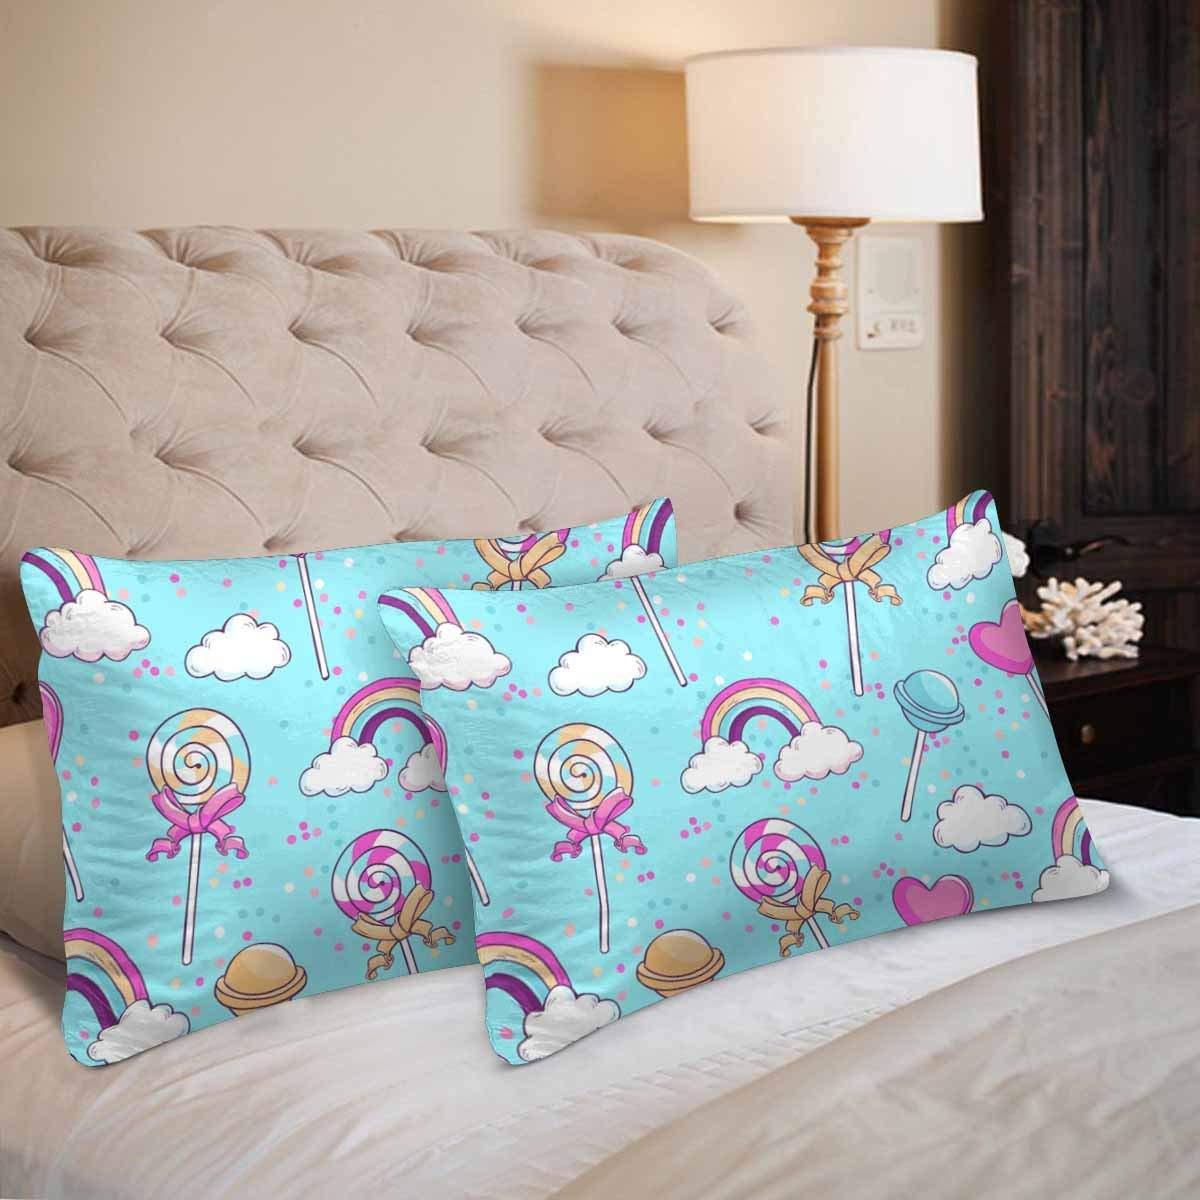 GCKG Lollipop Rainbow Cloud Sweet Candy Seamless Pillow Cases Pillowcase 20x30 inches Set of 2 - image 3 de 4